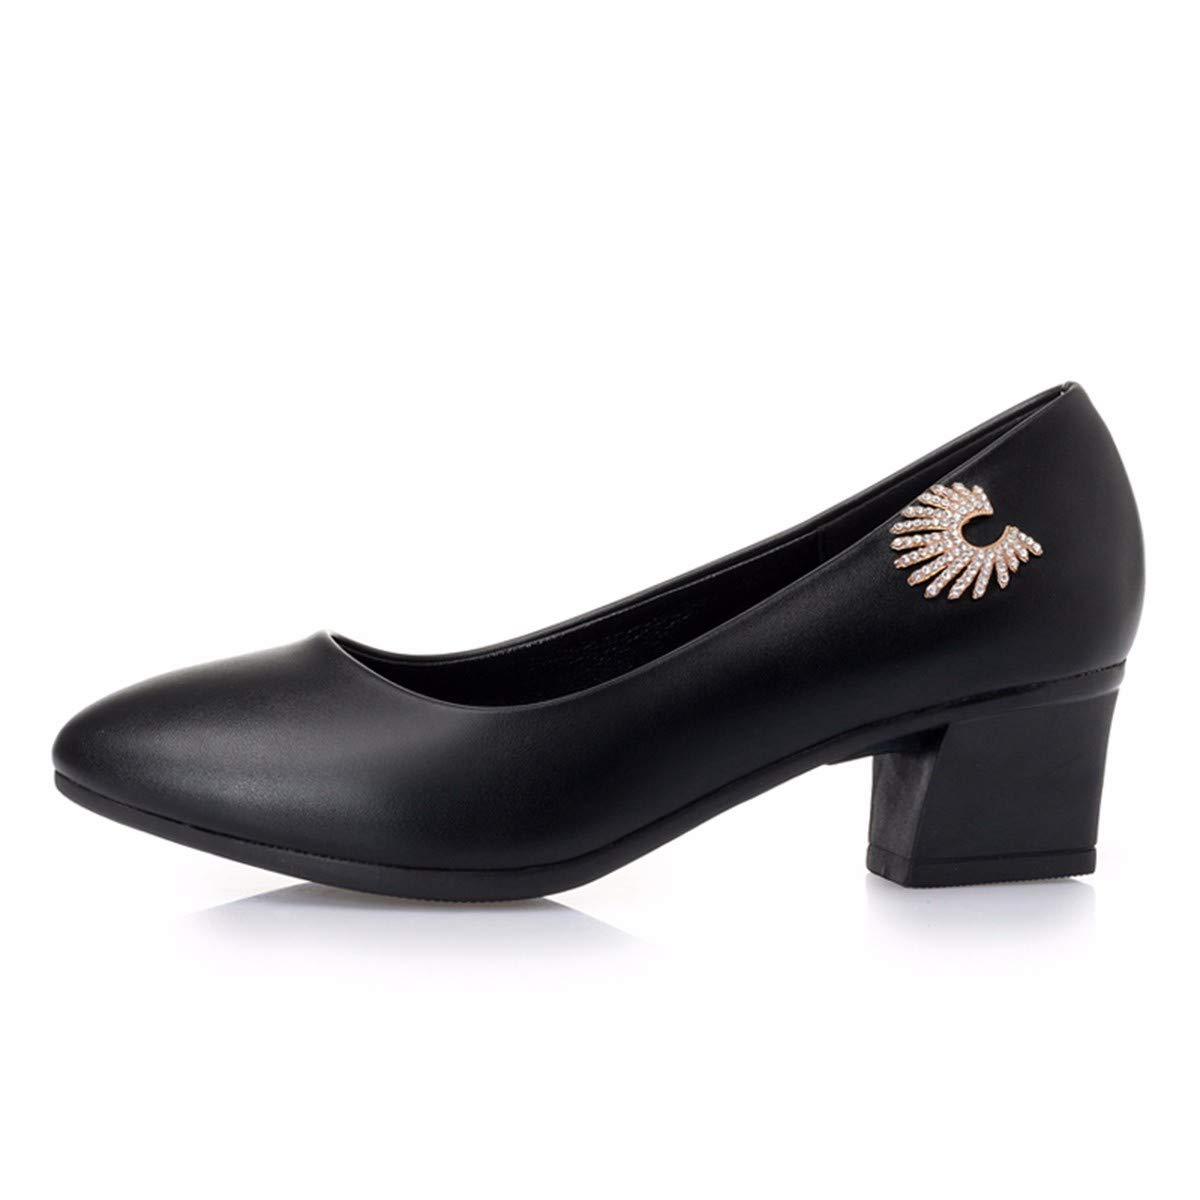 KPHY Damenschuhe/Joker Meine Schuhe Damen Lederschuhe Flache Schuhe Schuhe Meine Schuhe Mitte Weichen Boden Komfort.40 Schwarz - 417ec4